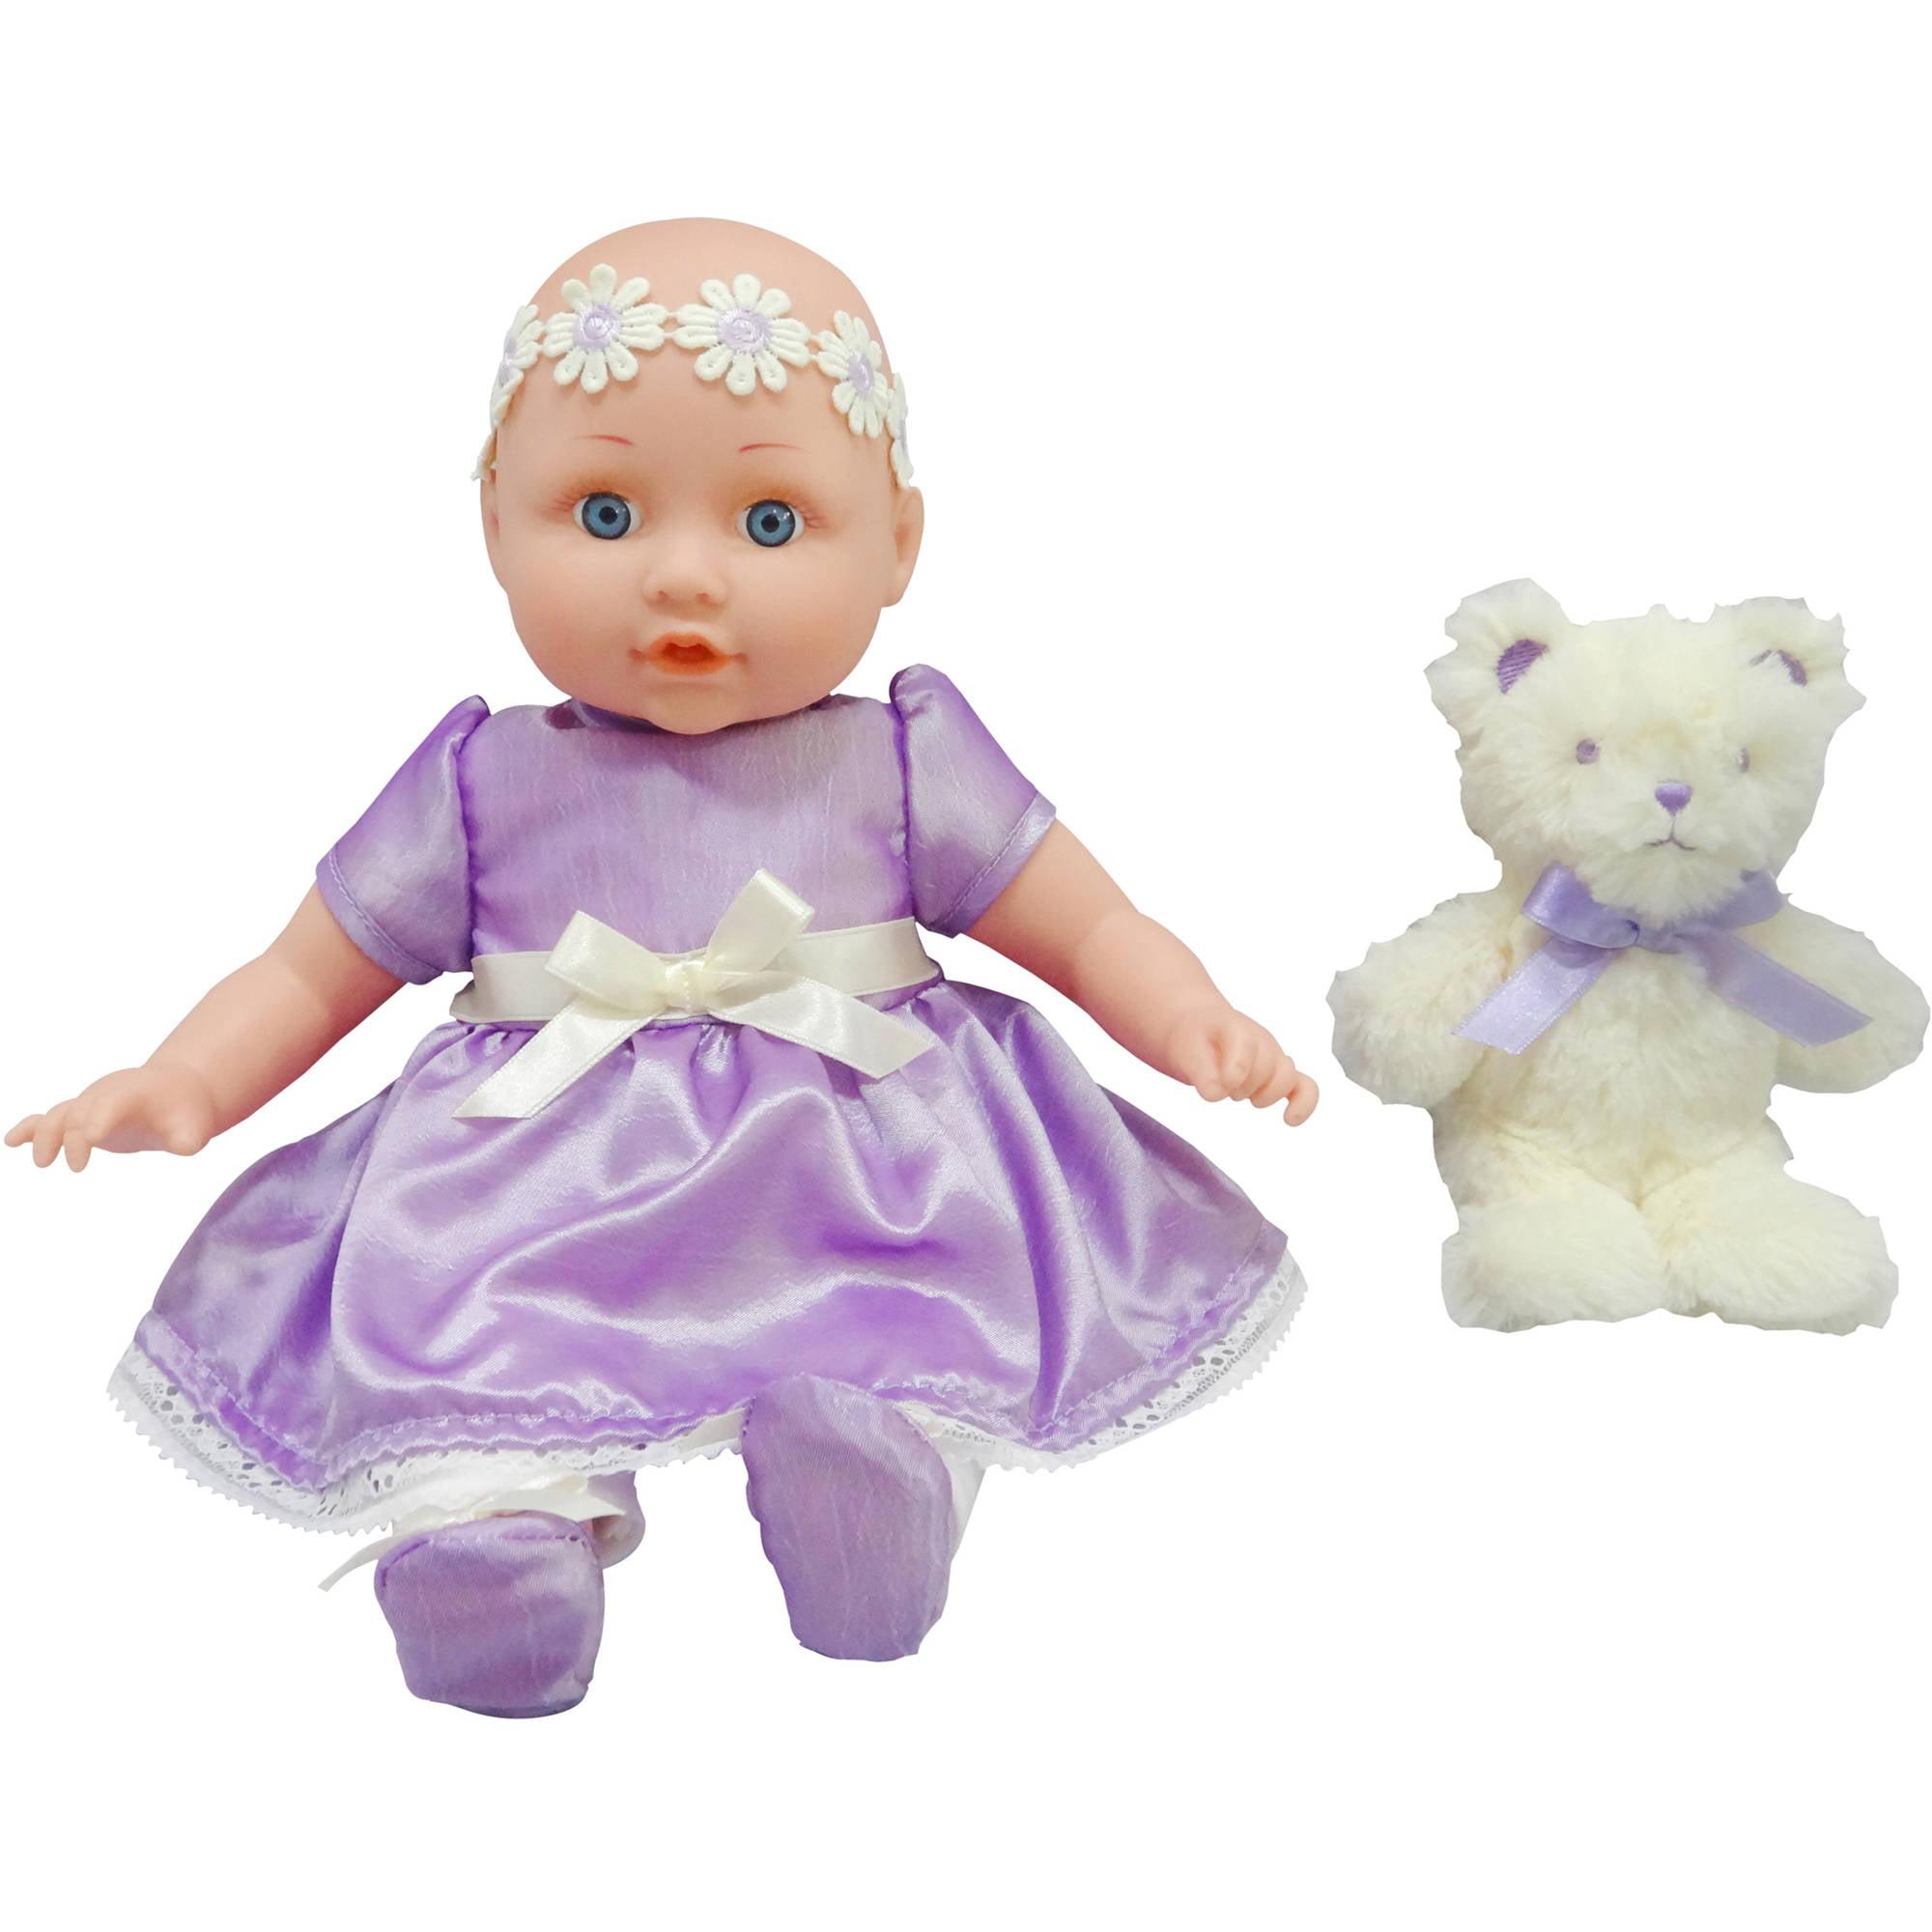 My Sweet Love Baby Doll & Plush Bear by